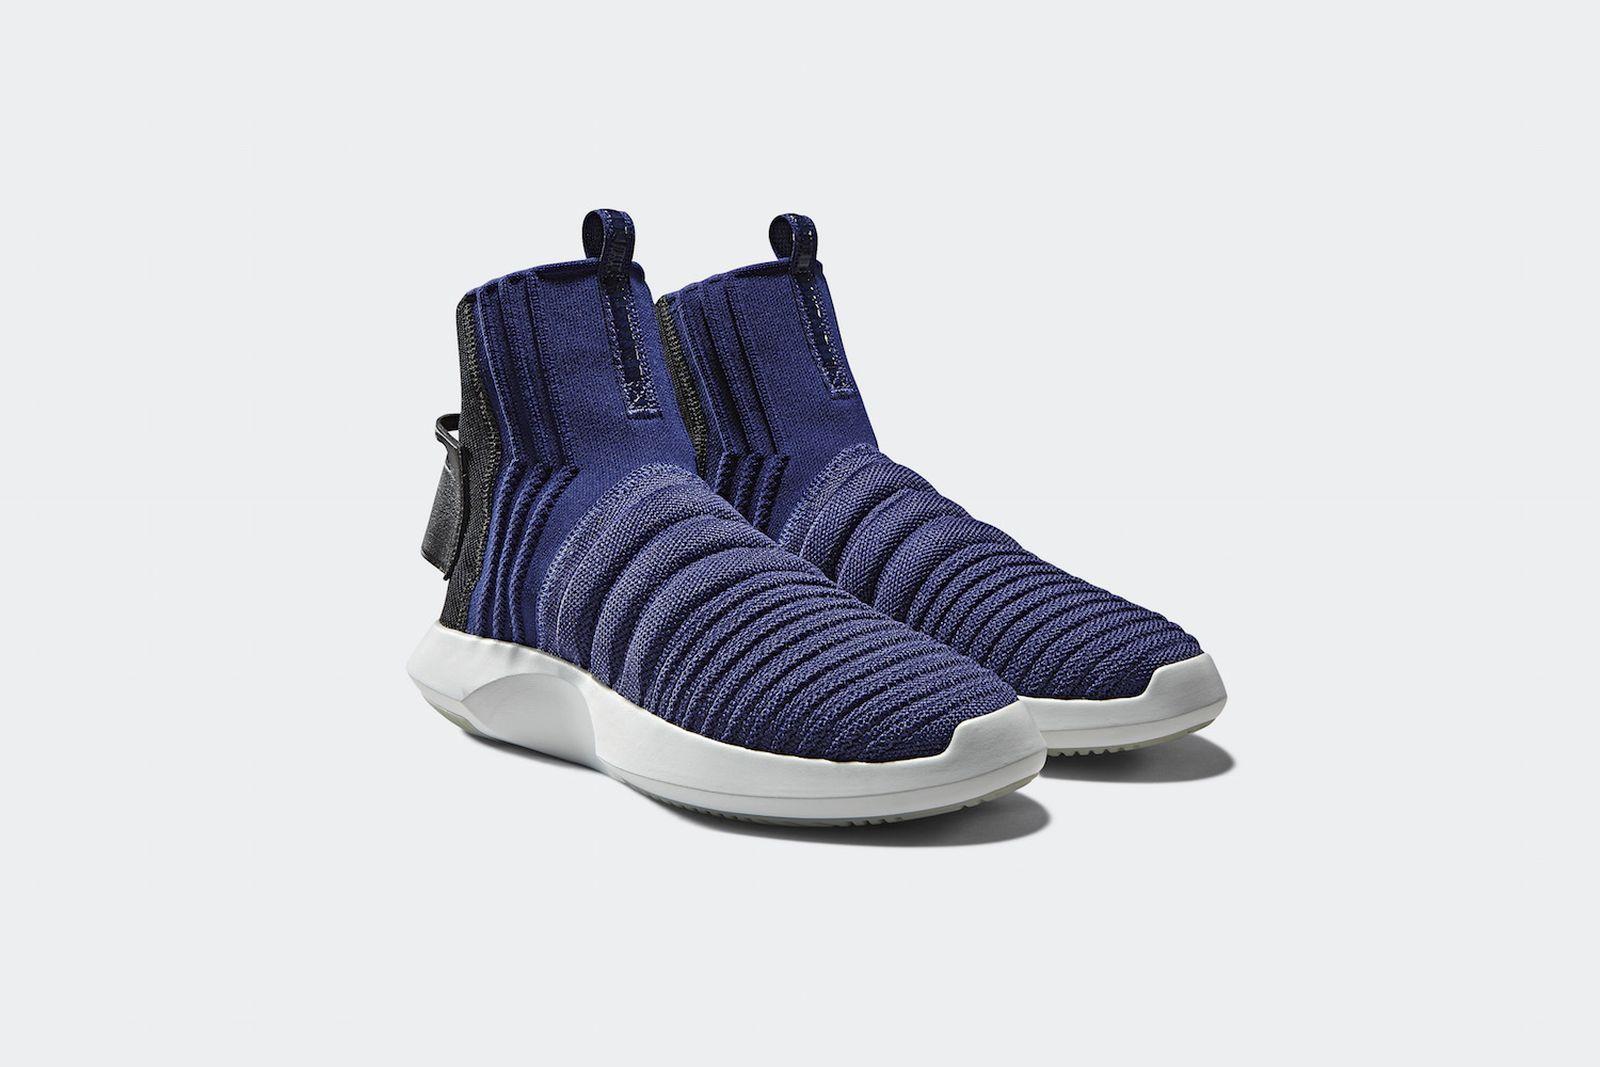 adidas crazy 1 adv sock